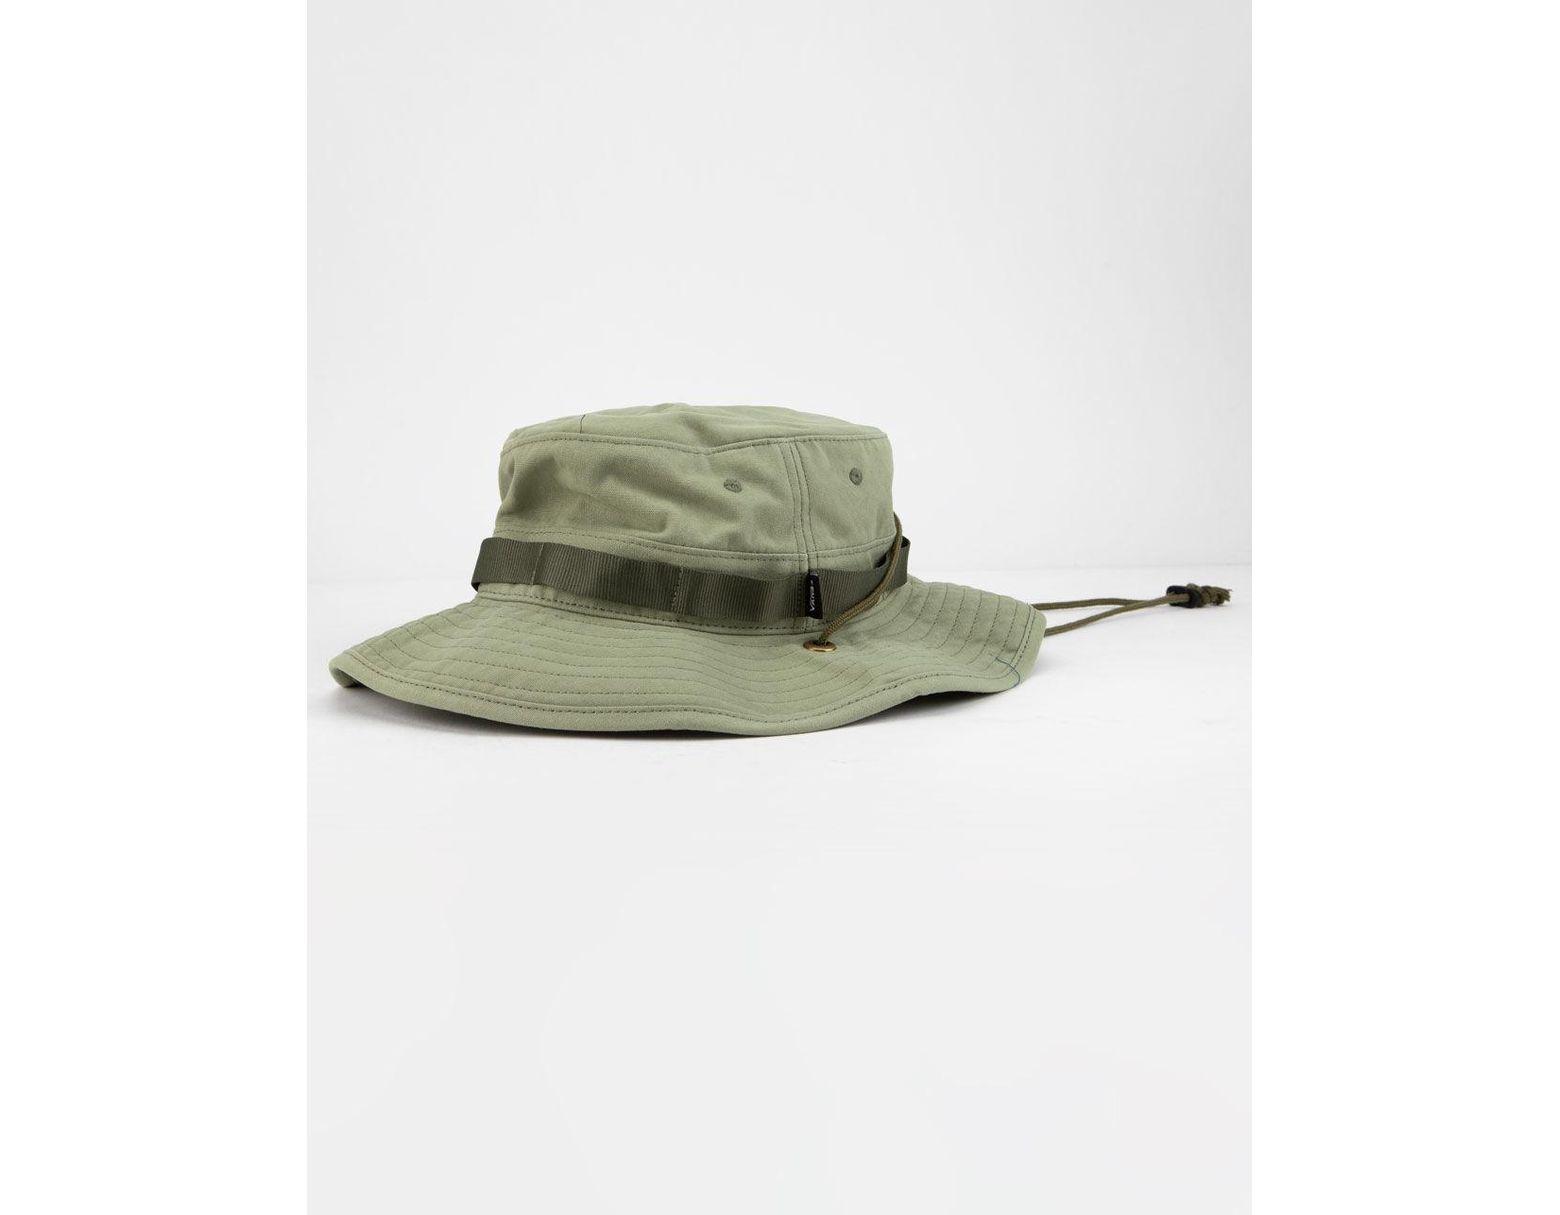 22d8f31fe00b7 Vans Boonie Oil Green Mens Bucket Hat in Green for Men - Lyst